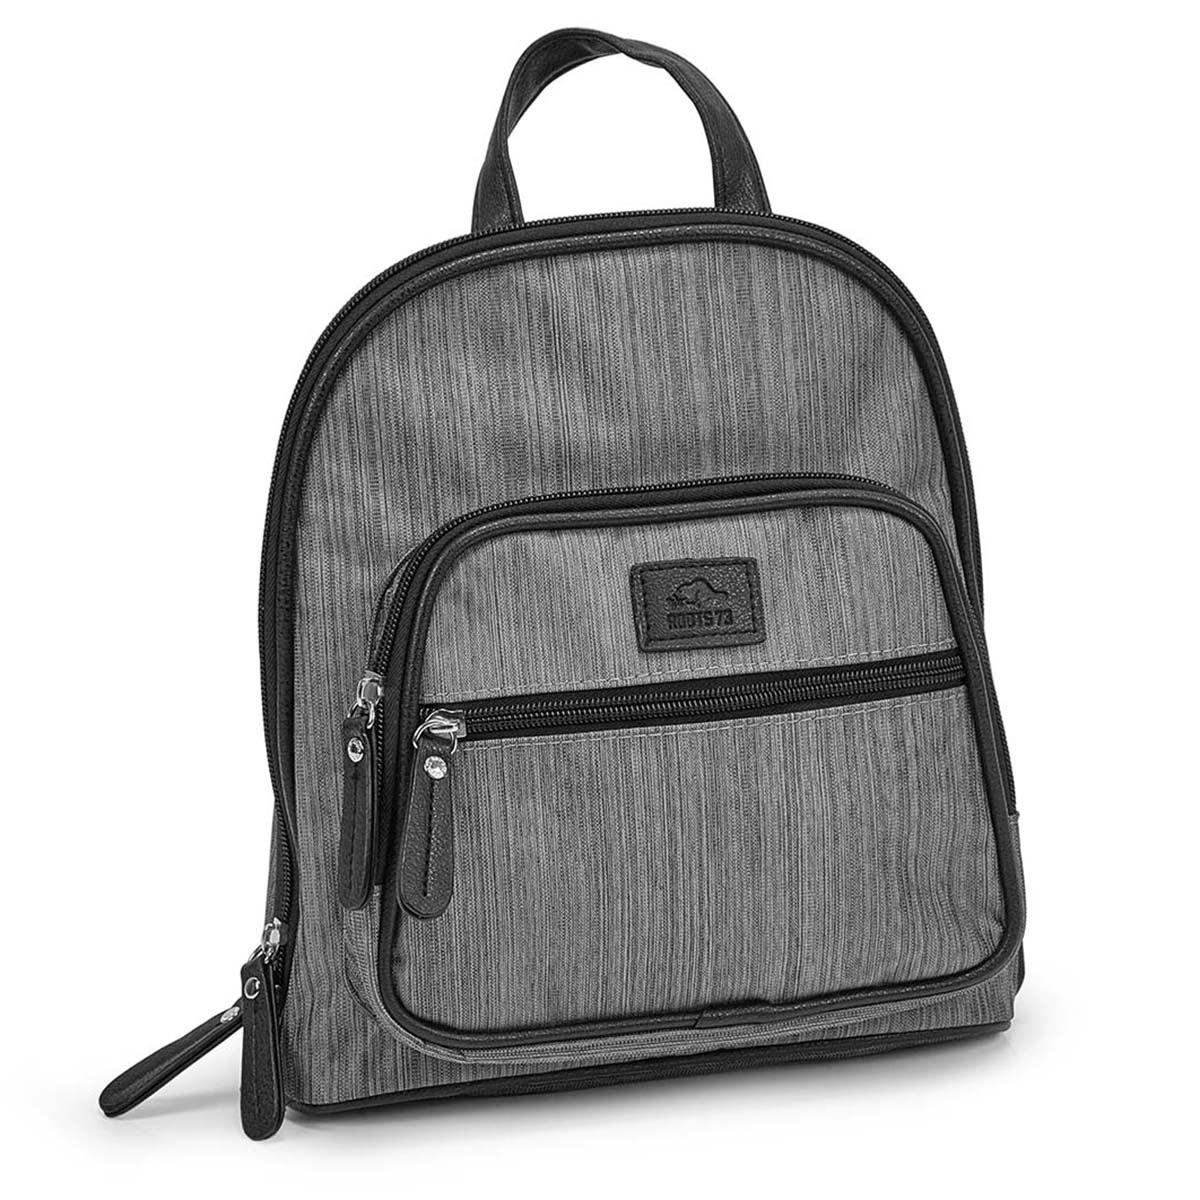 Women's R5241 grey mini back pack bag